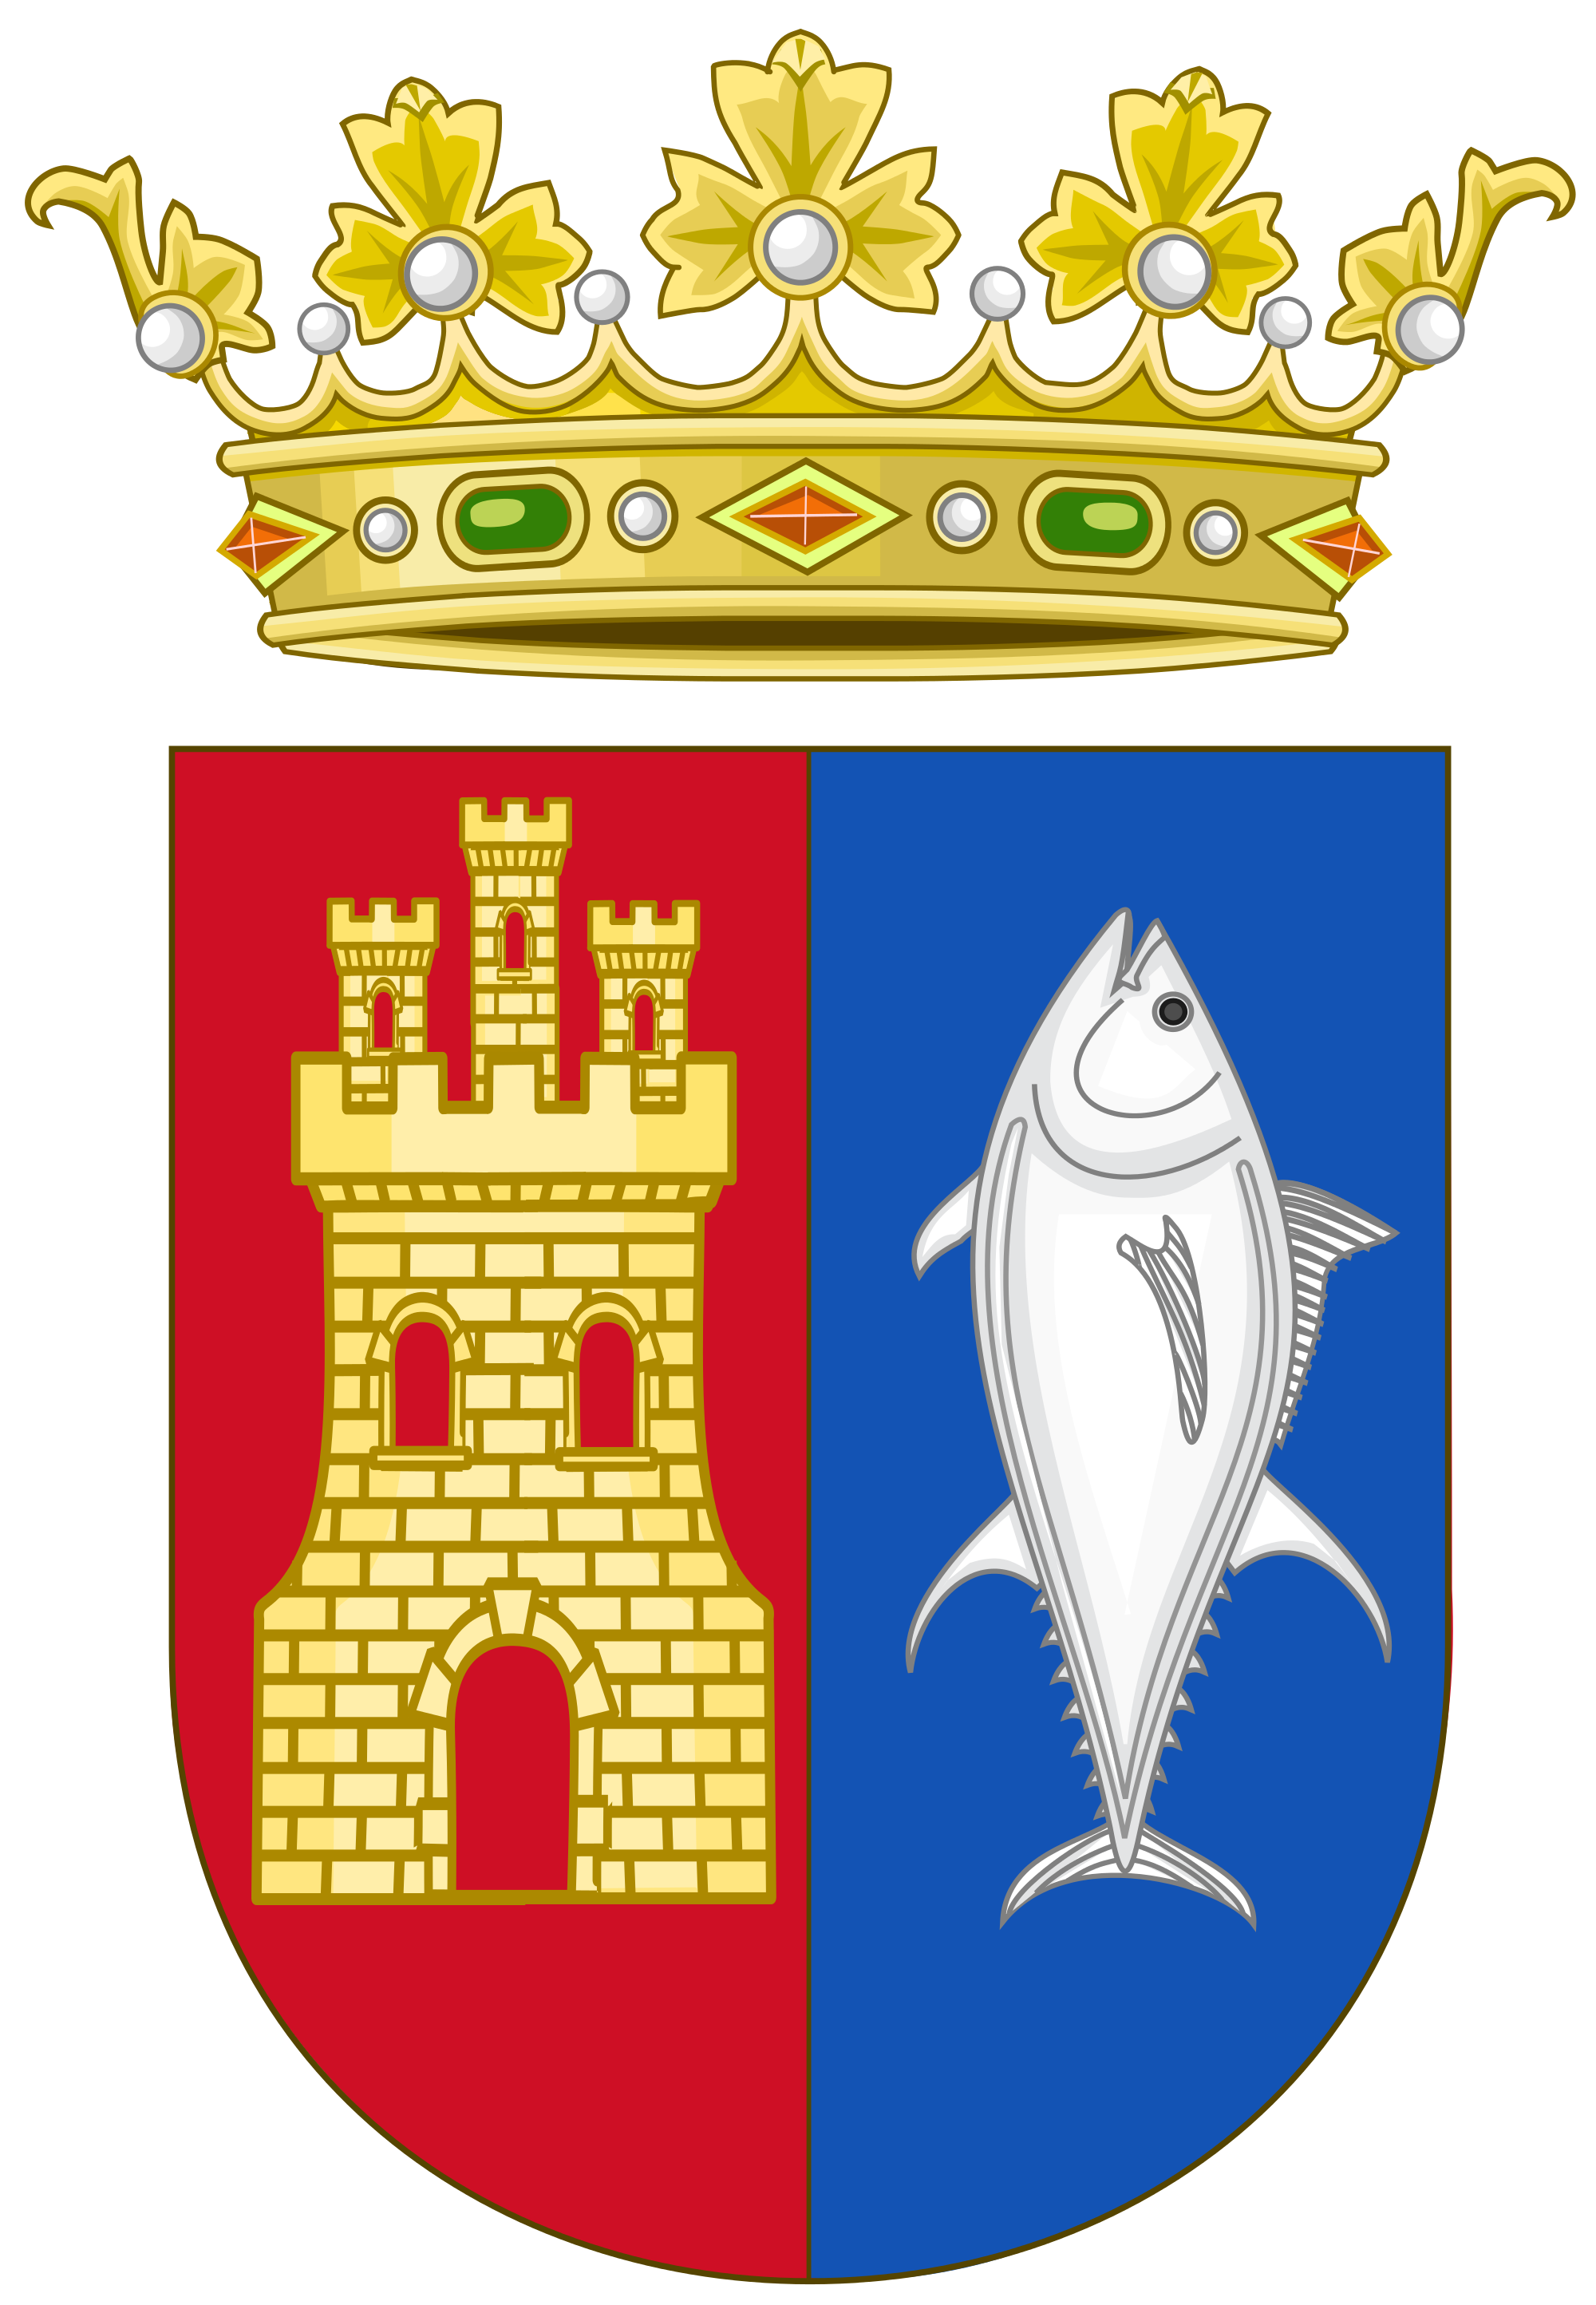 File:Coat of Arms of Conil de la Frontera.svg.